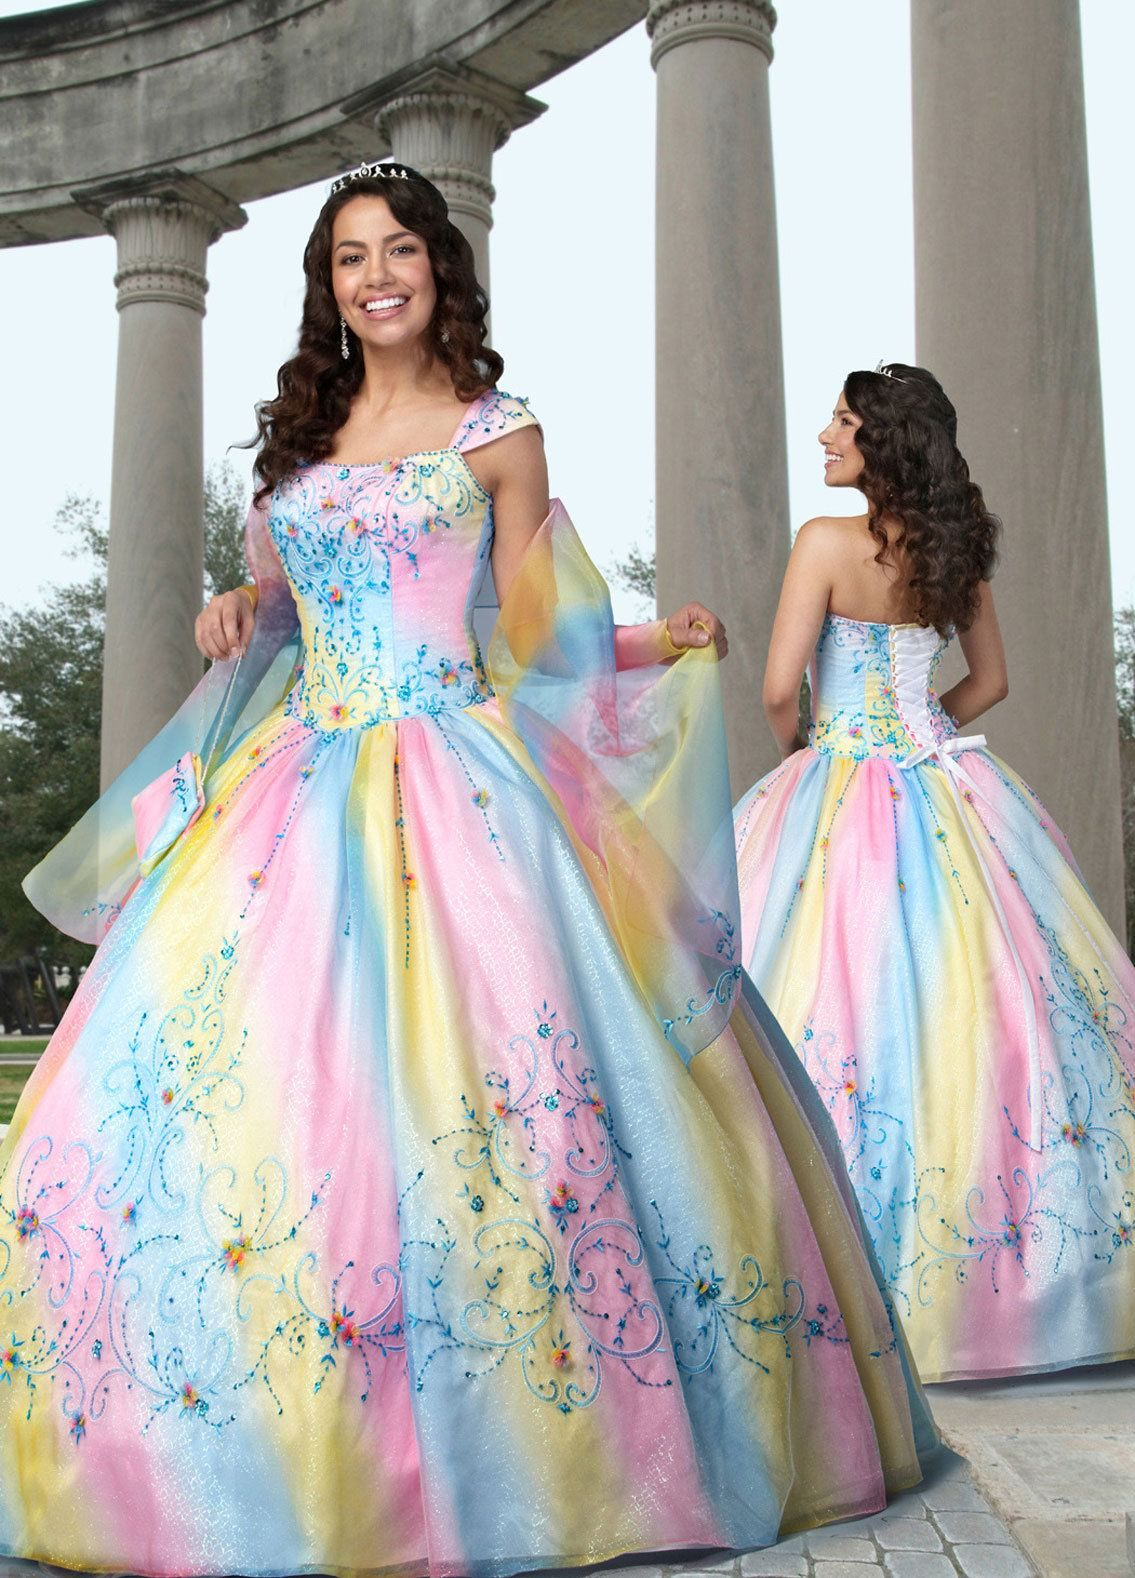 rainbow ball dress | Dresses(: | Pinterest | Traumkleider, Ballkleid ...